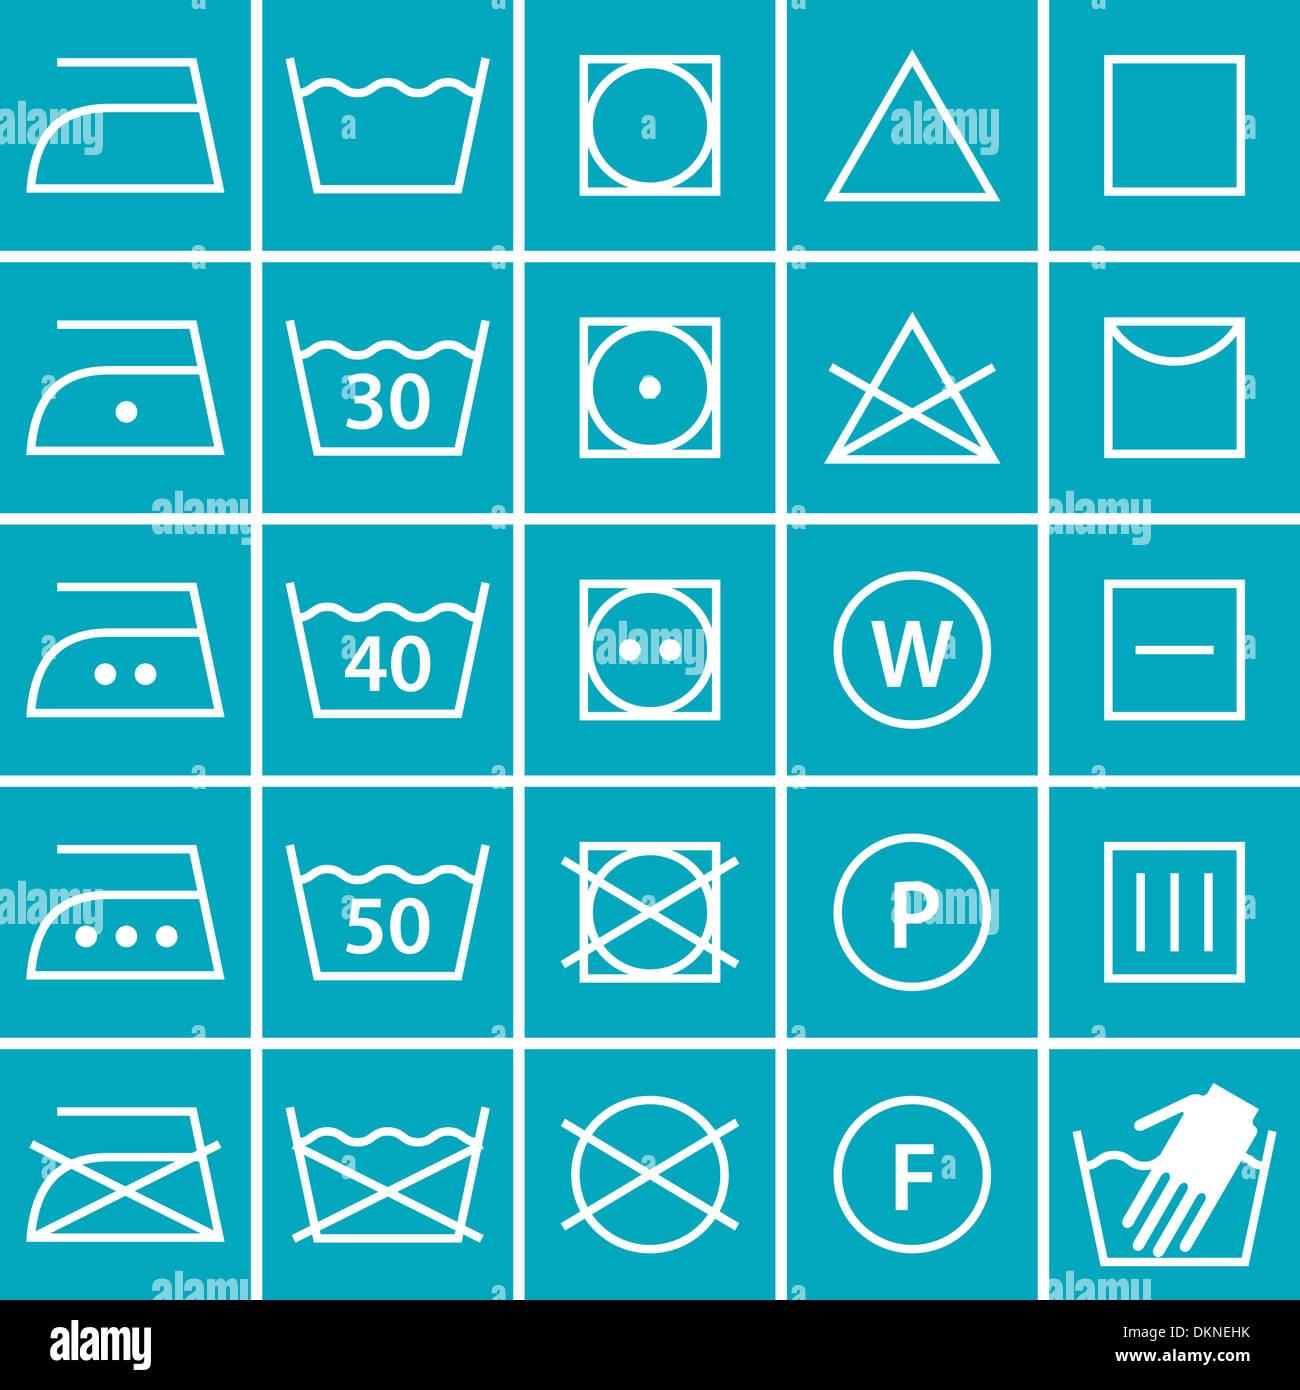 fabric care symbols stockfotos fabric care symbols. Black Bedroom Furniture Sets. Home Design Ideas